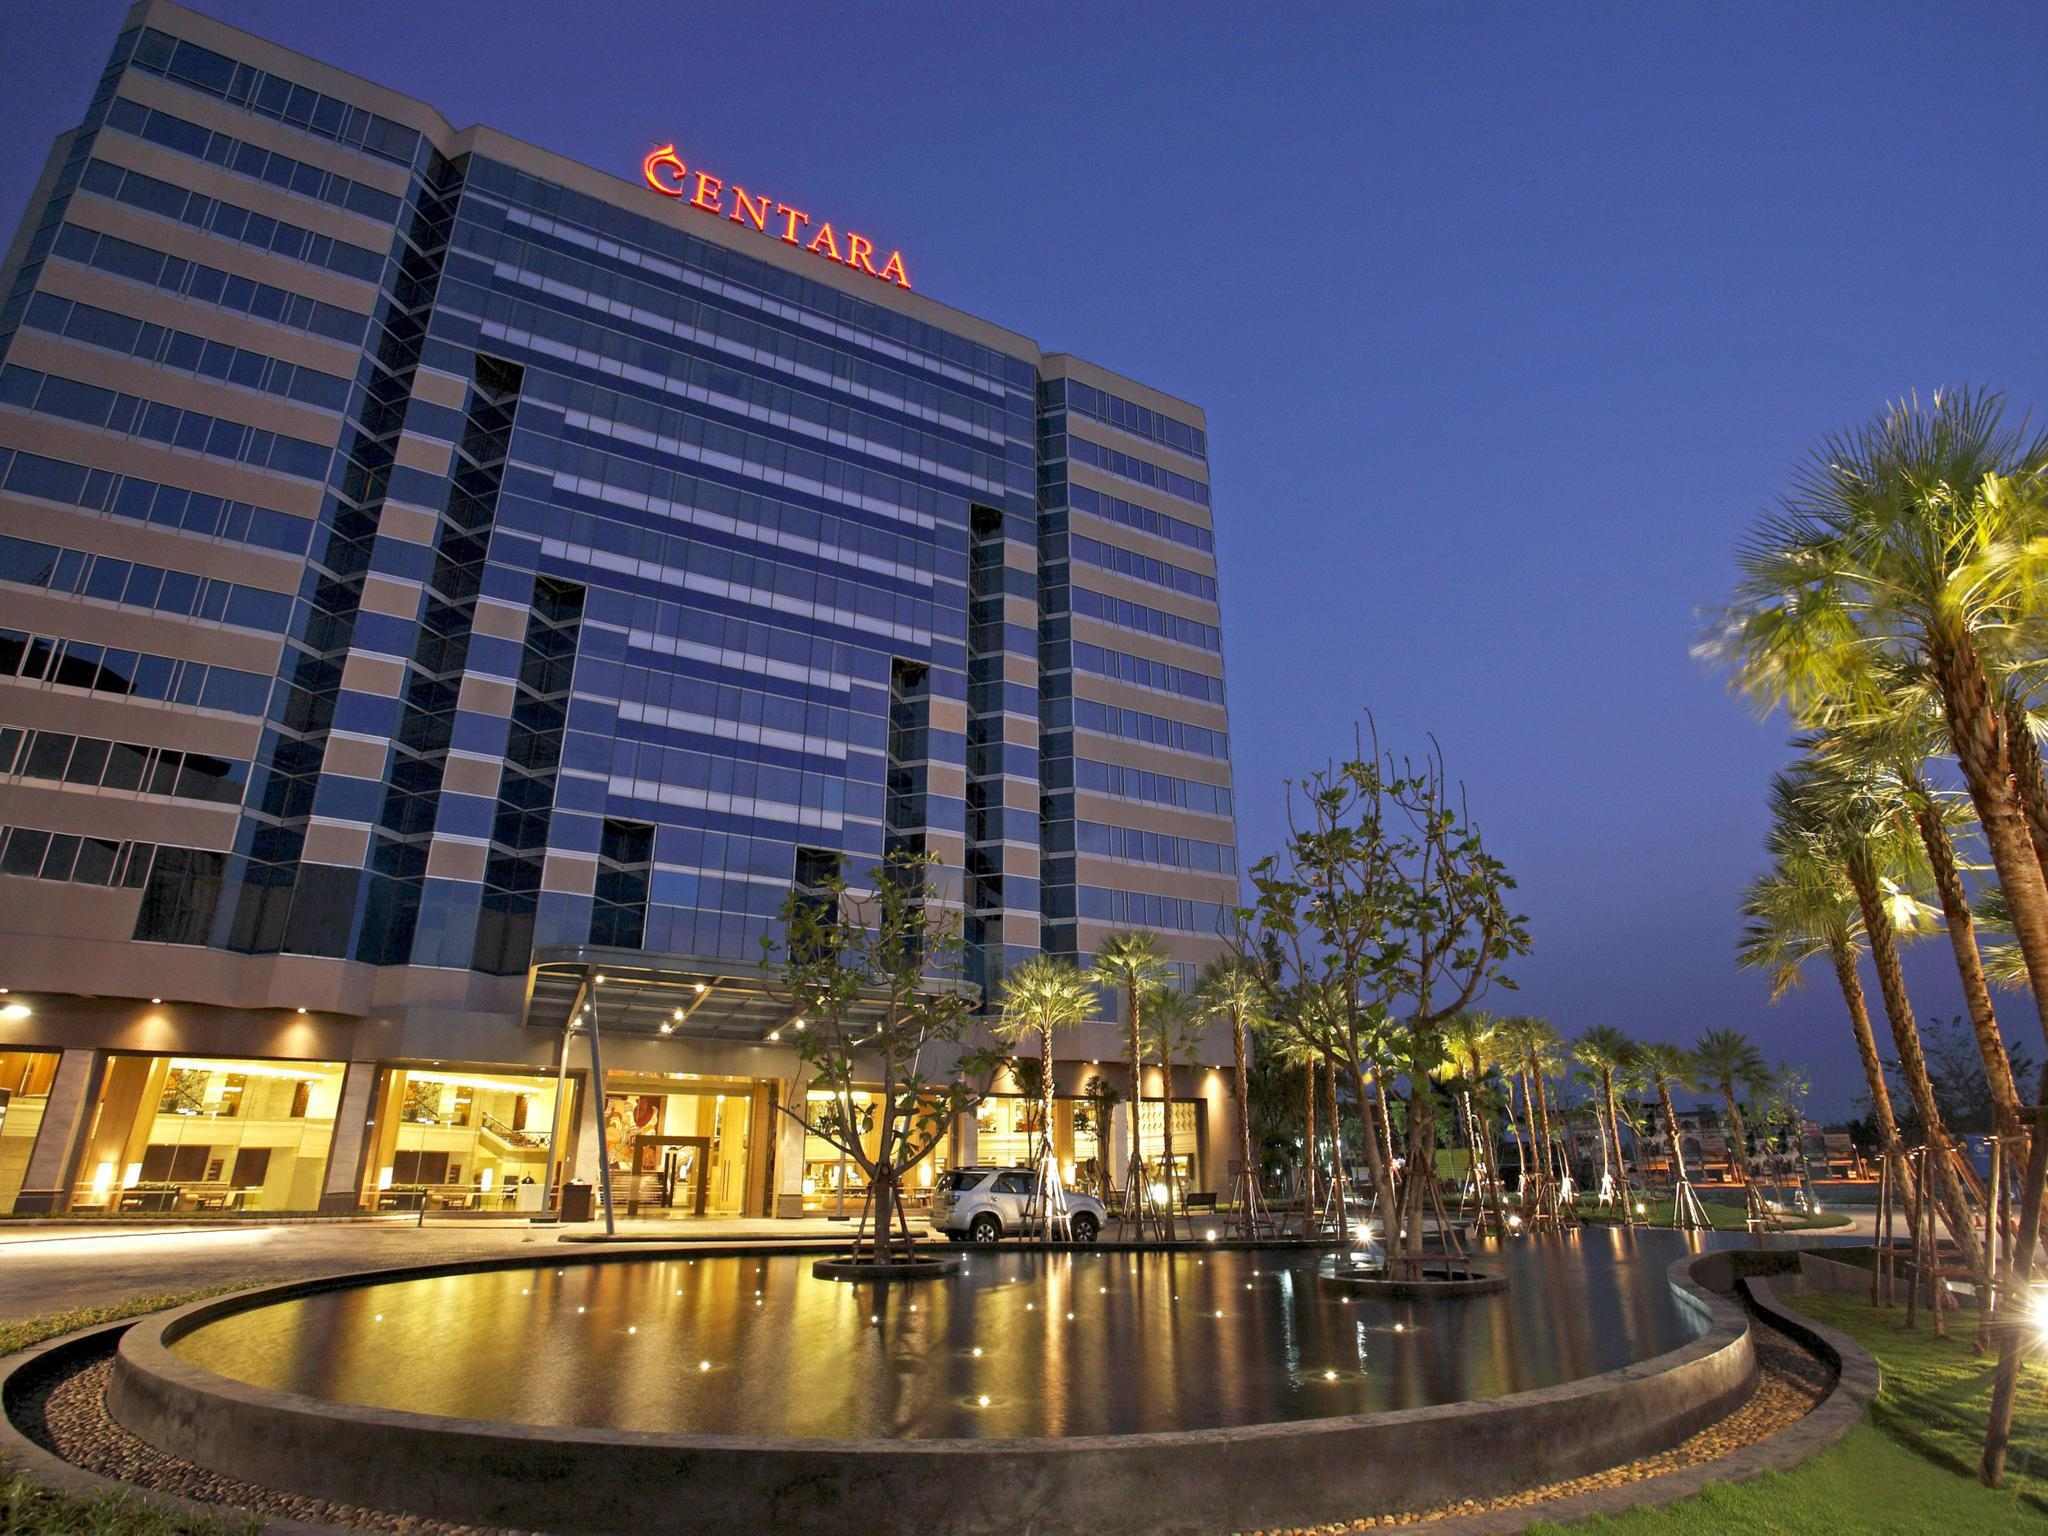 Centara Hotel & Convention Centre Udon Thani เซ็นทารา โฮเต็ล แอนด์ คอนเวนชั่น เซ็นเตอร์ อุดรธานี